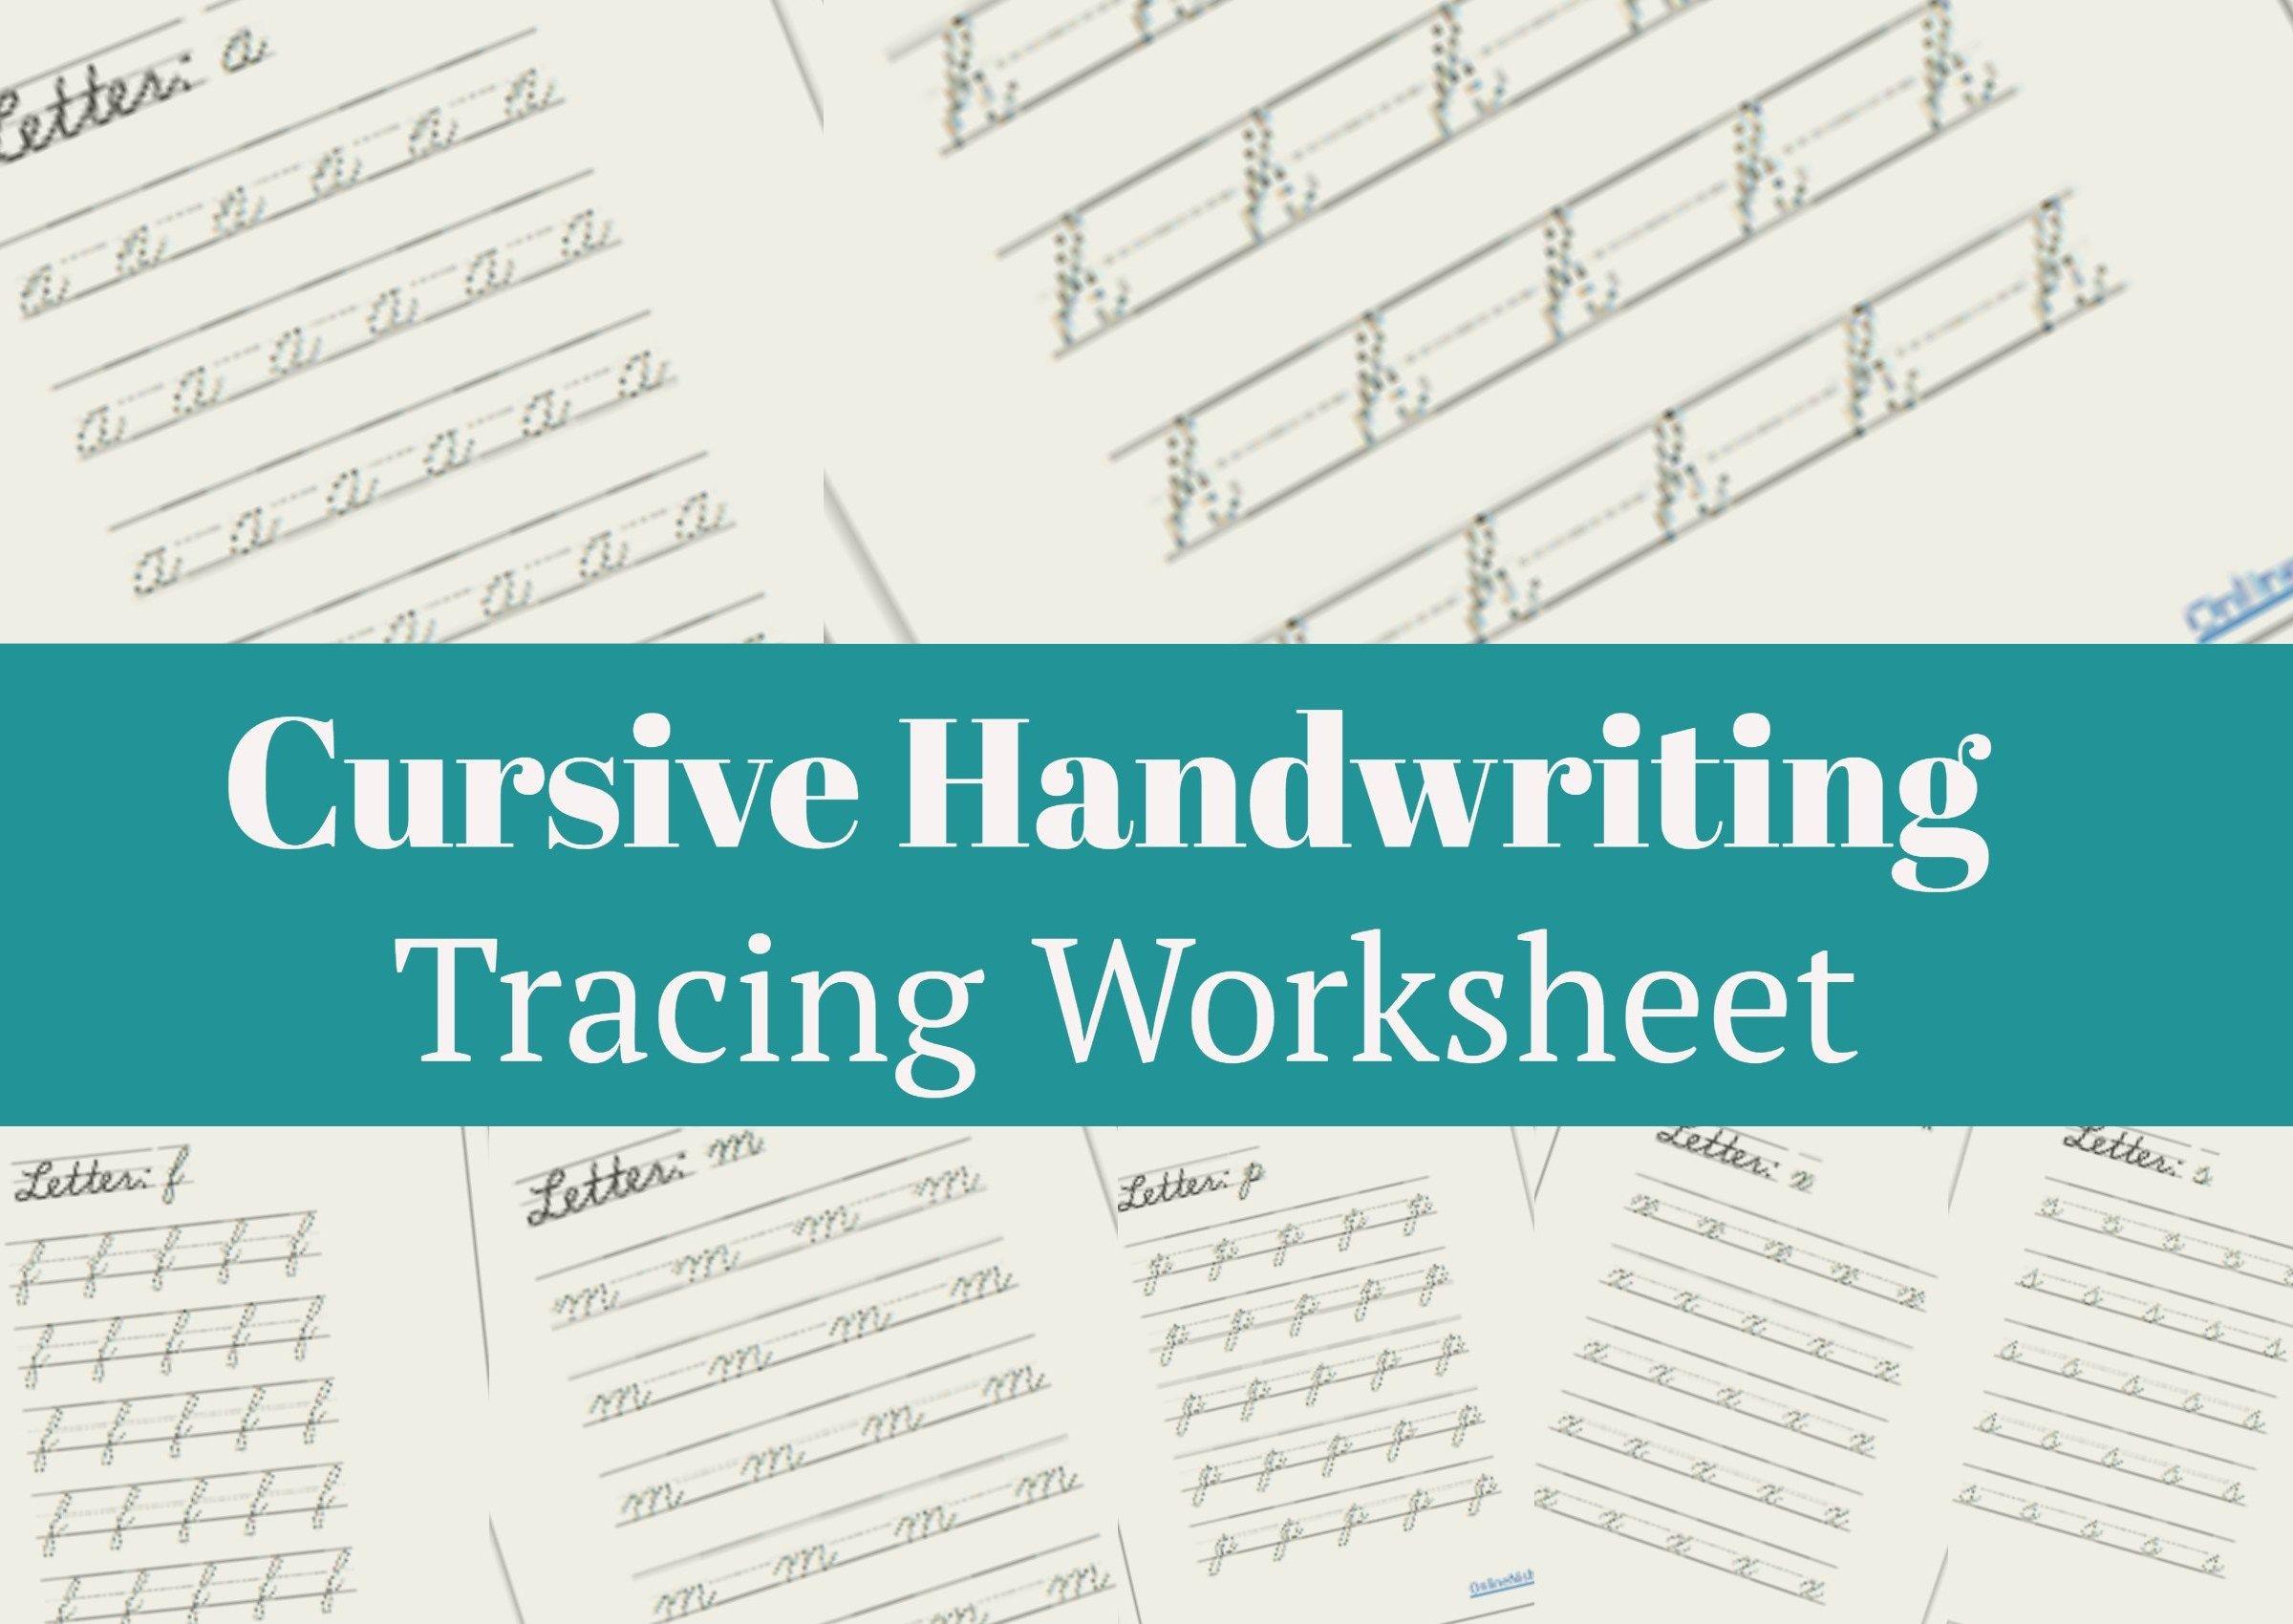 Lowercase Cursive Handwriting Worksheet Free